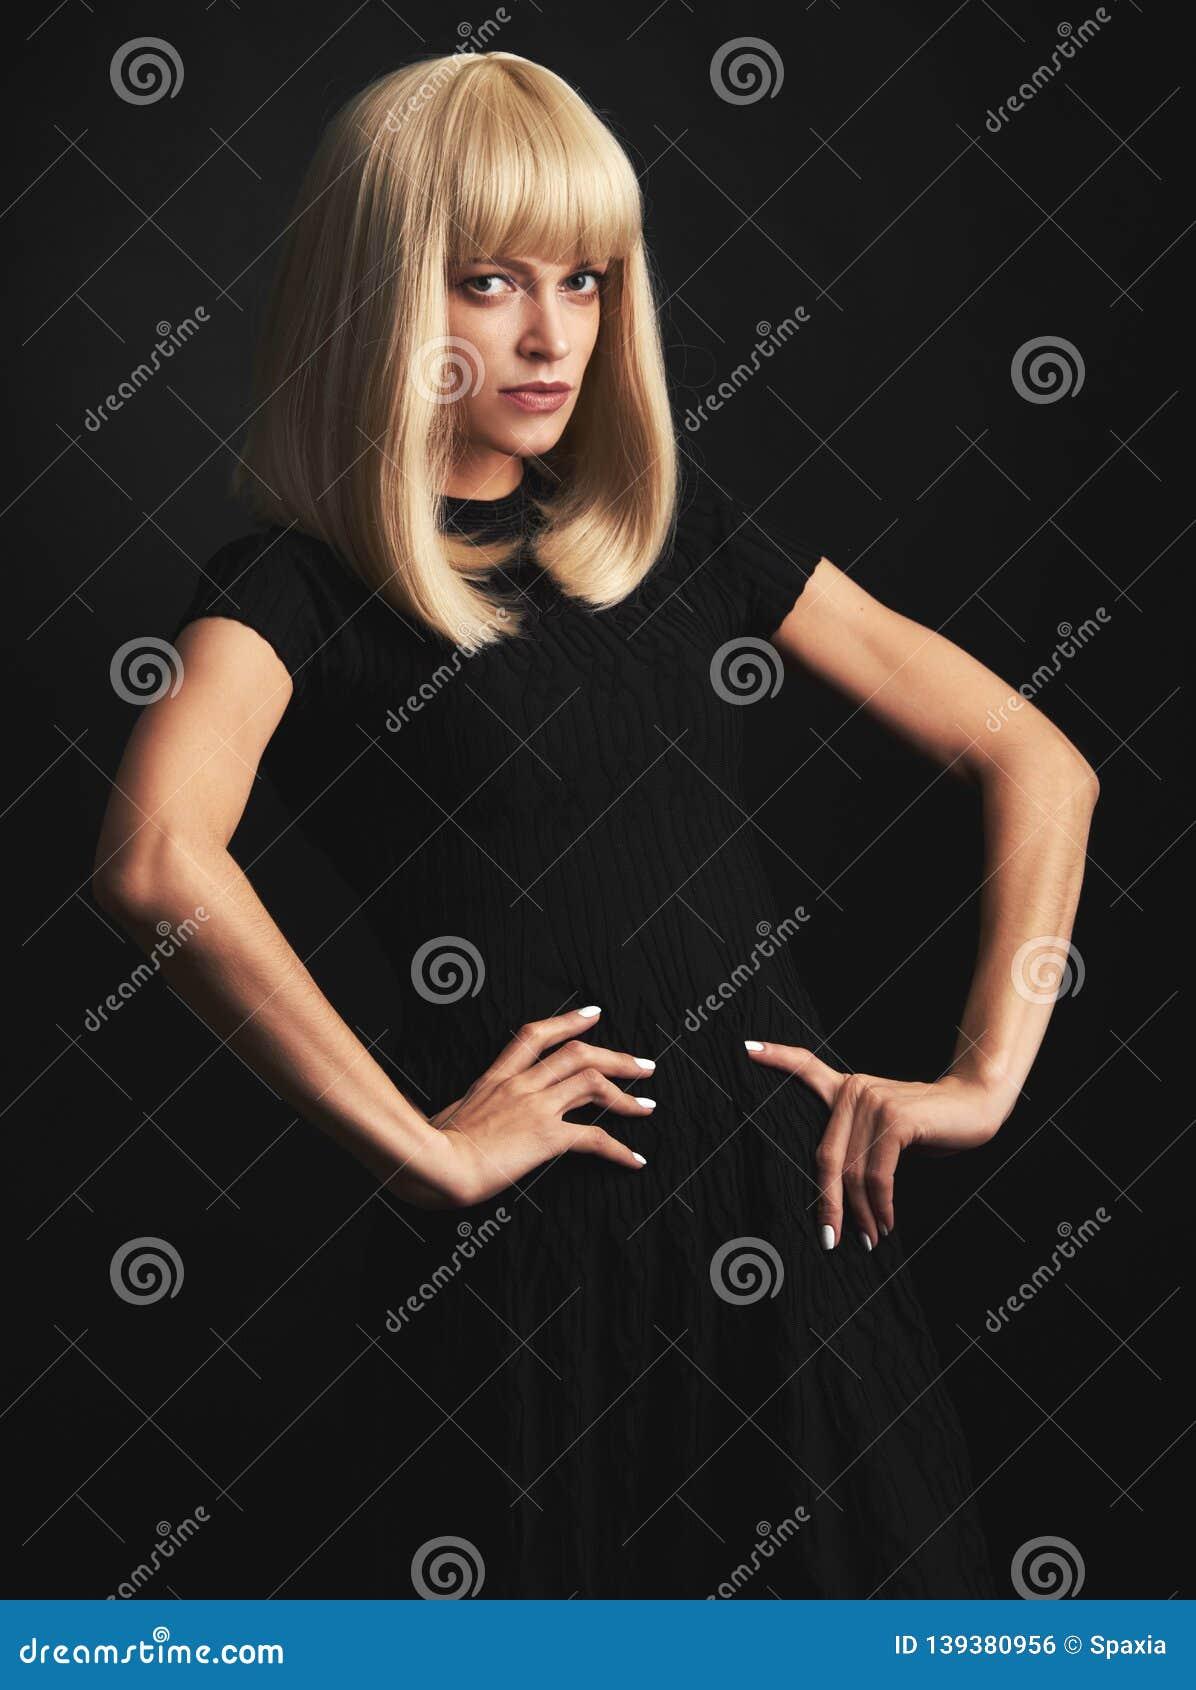 Attractive blonde woman studio portrait